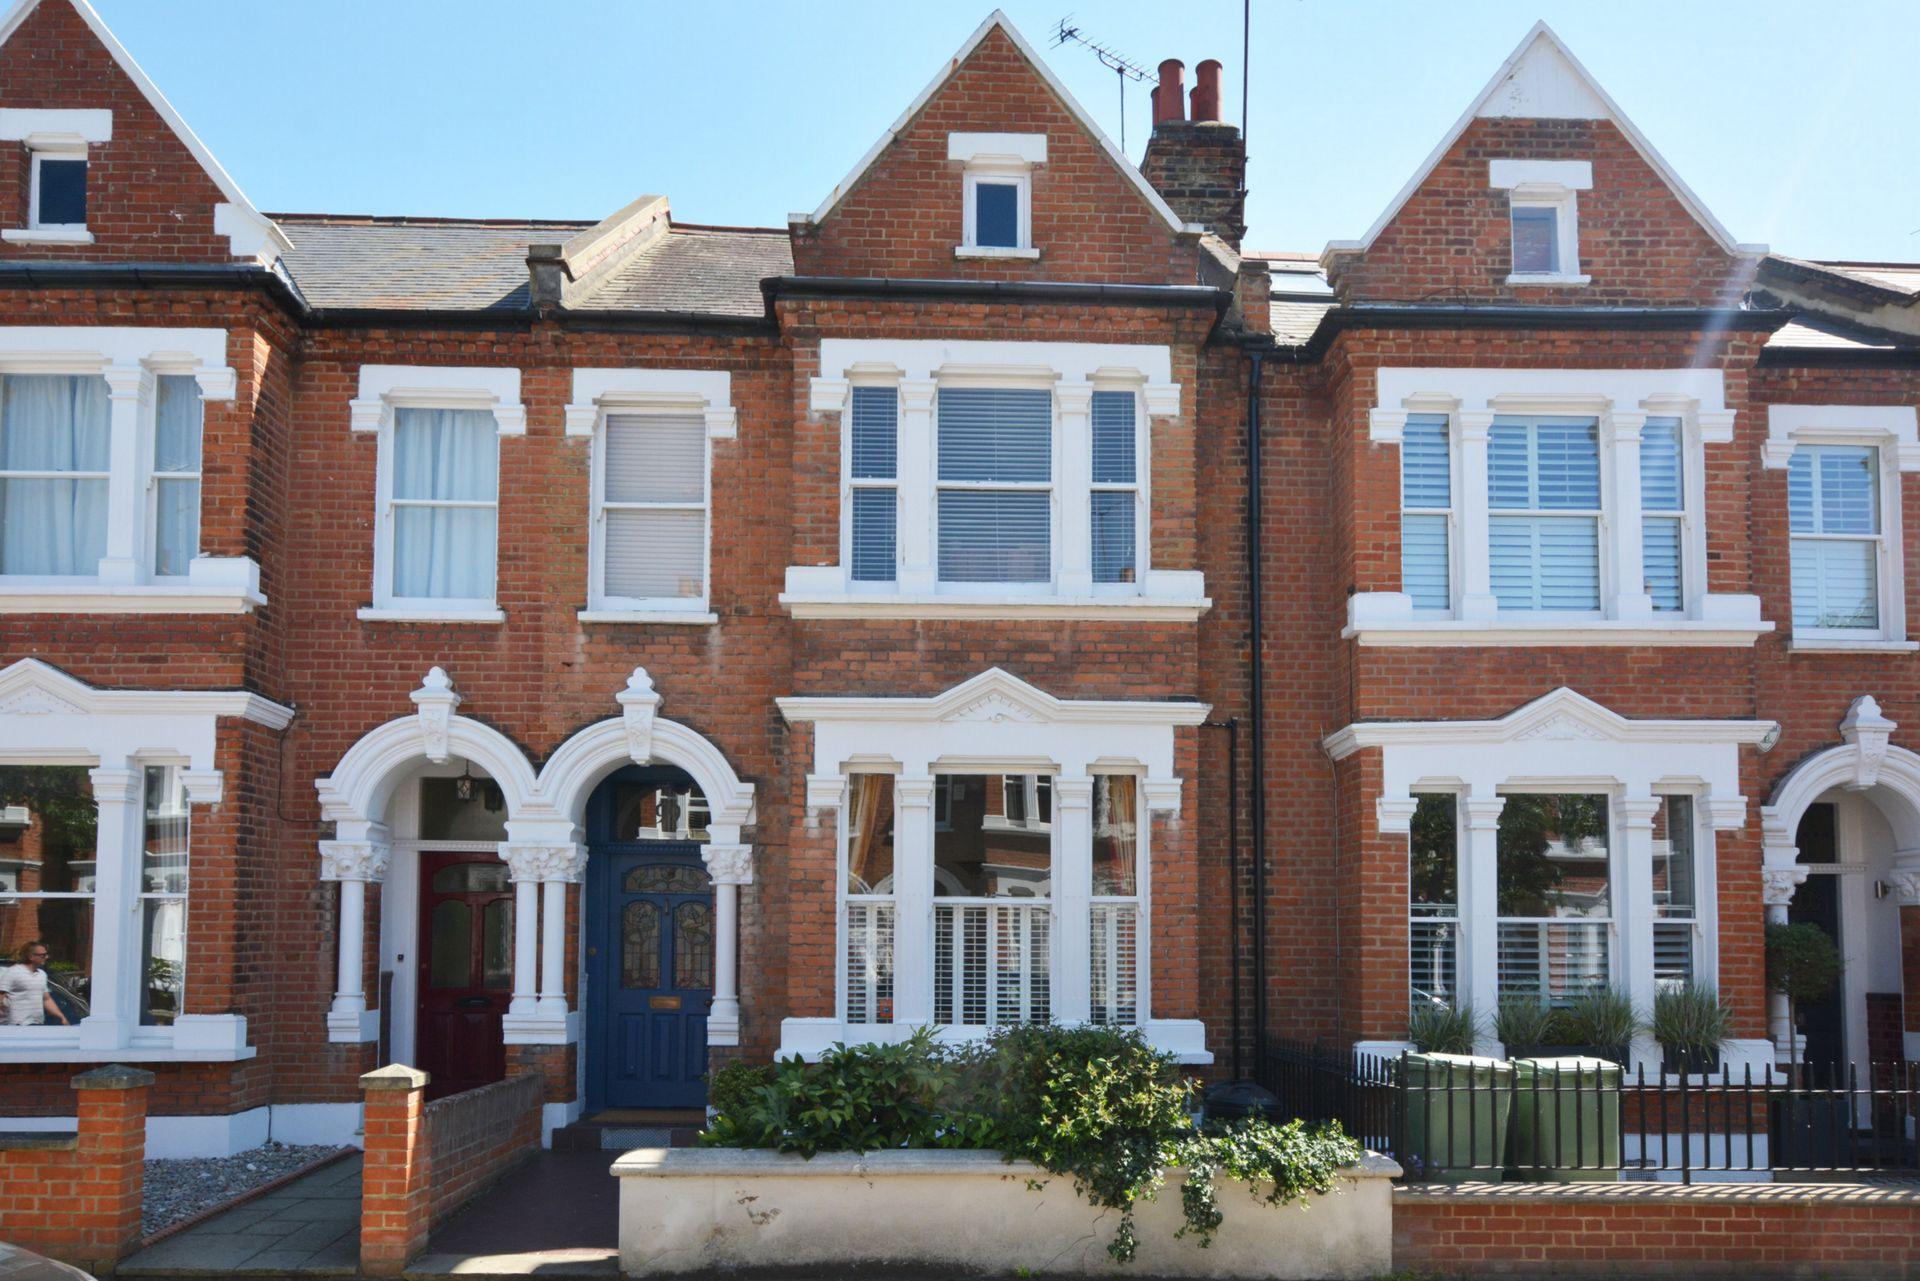 Elm Grove Road  Barnes  London  SW13